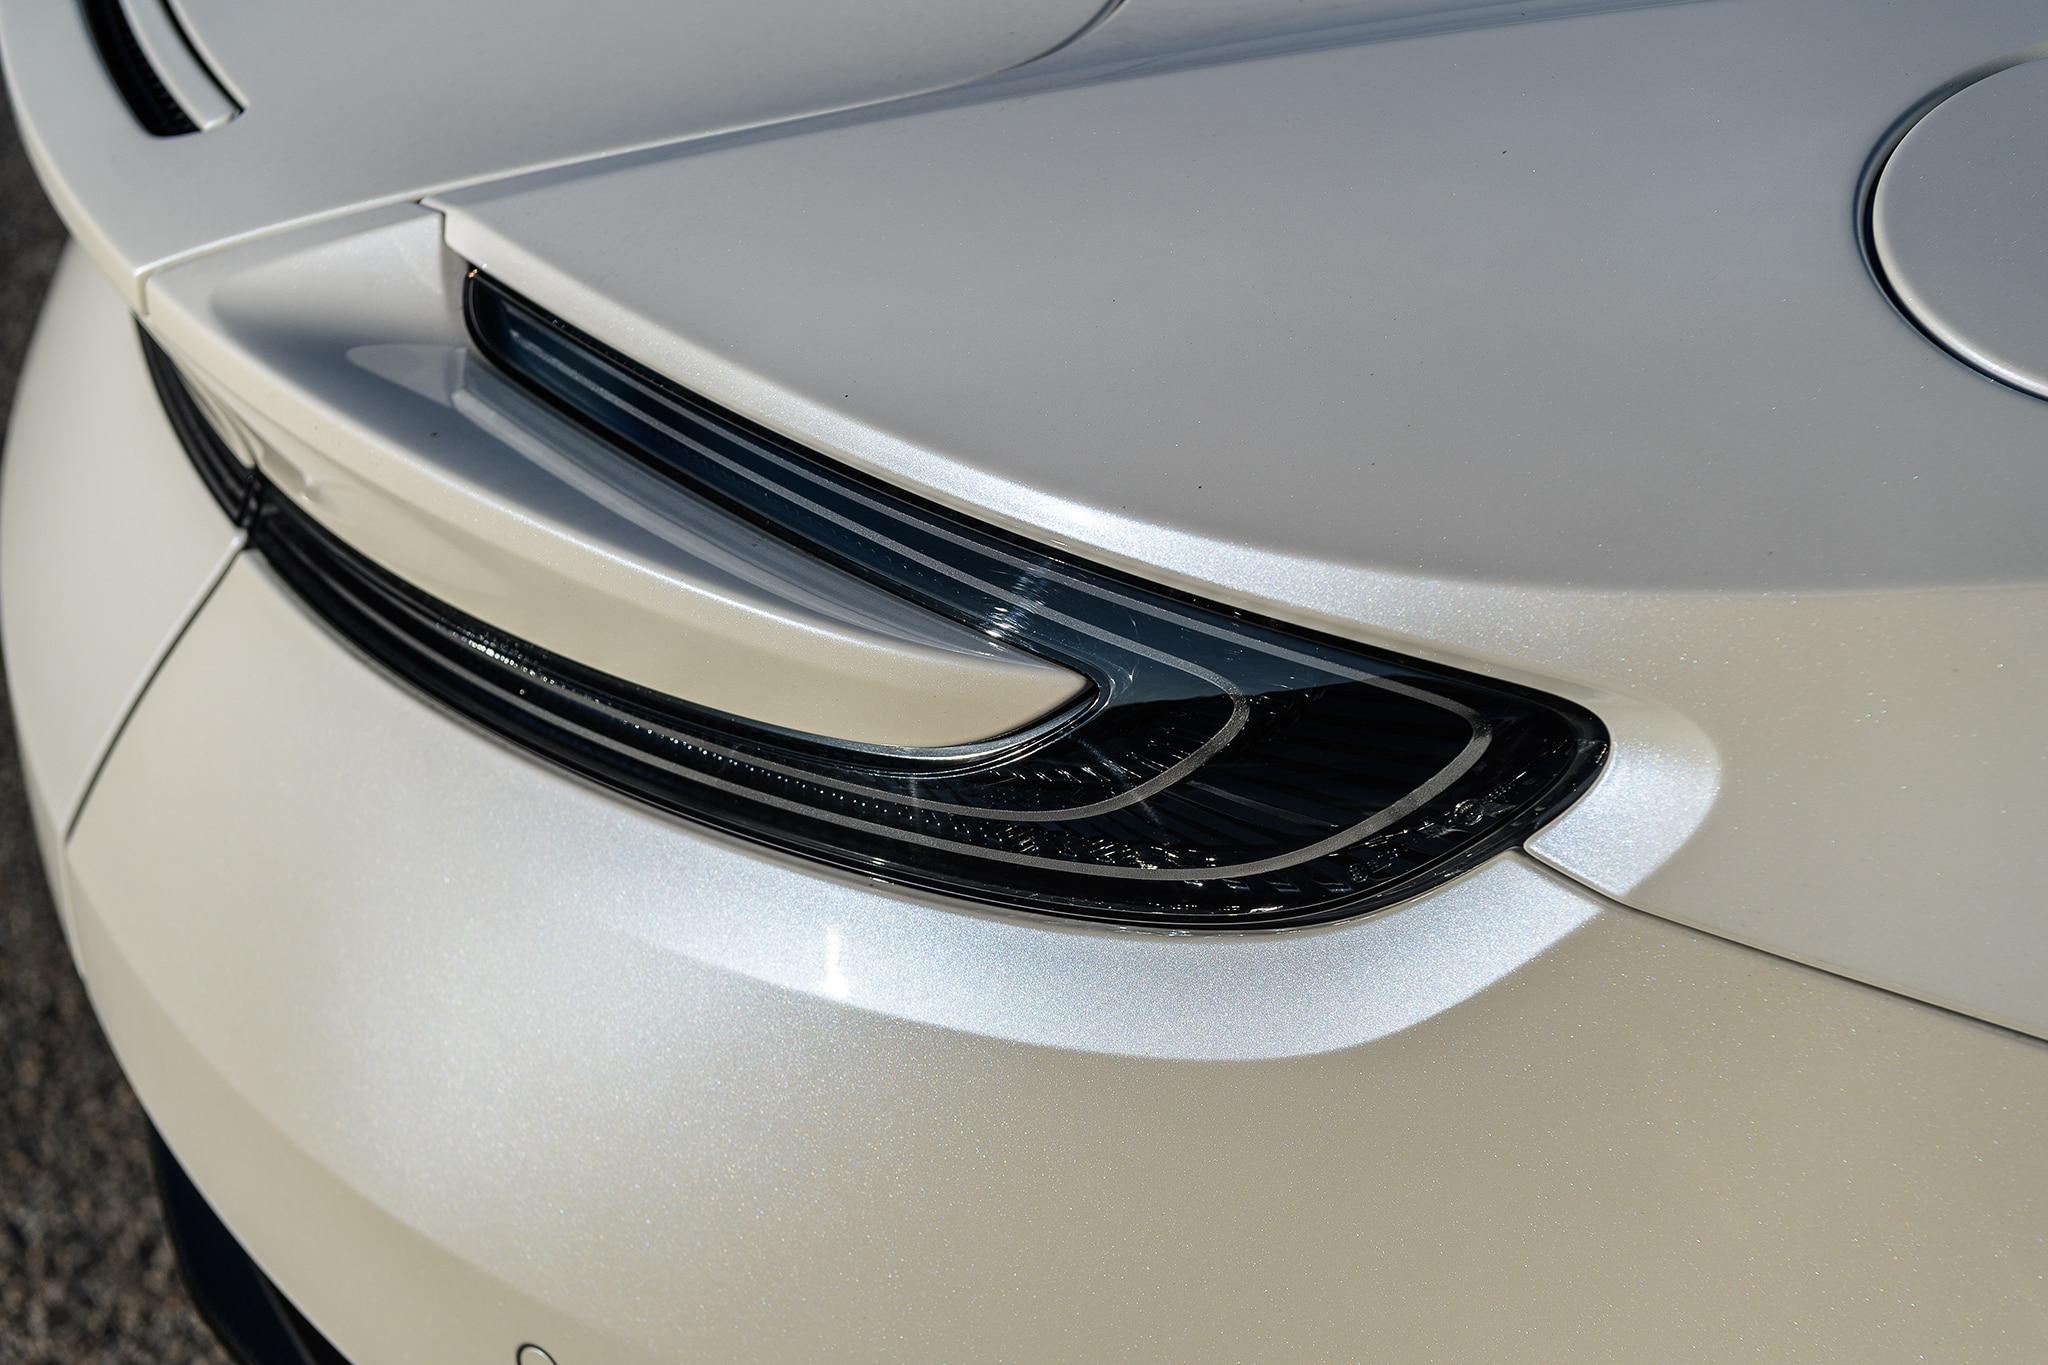 2018 aston martin db11 v-8 first drive review | automobile magazine